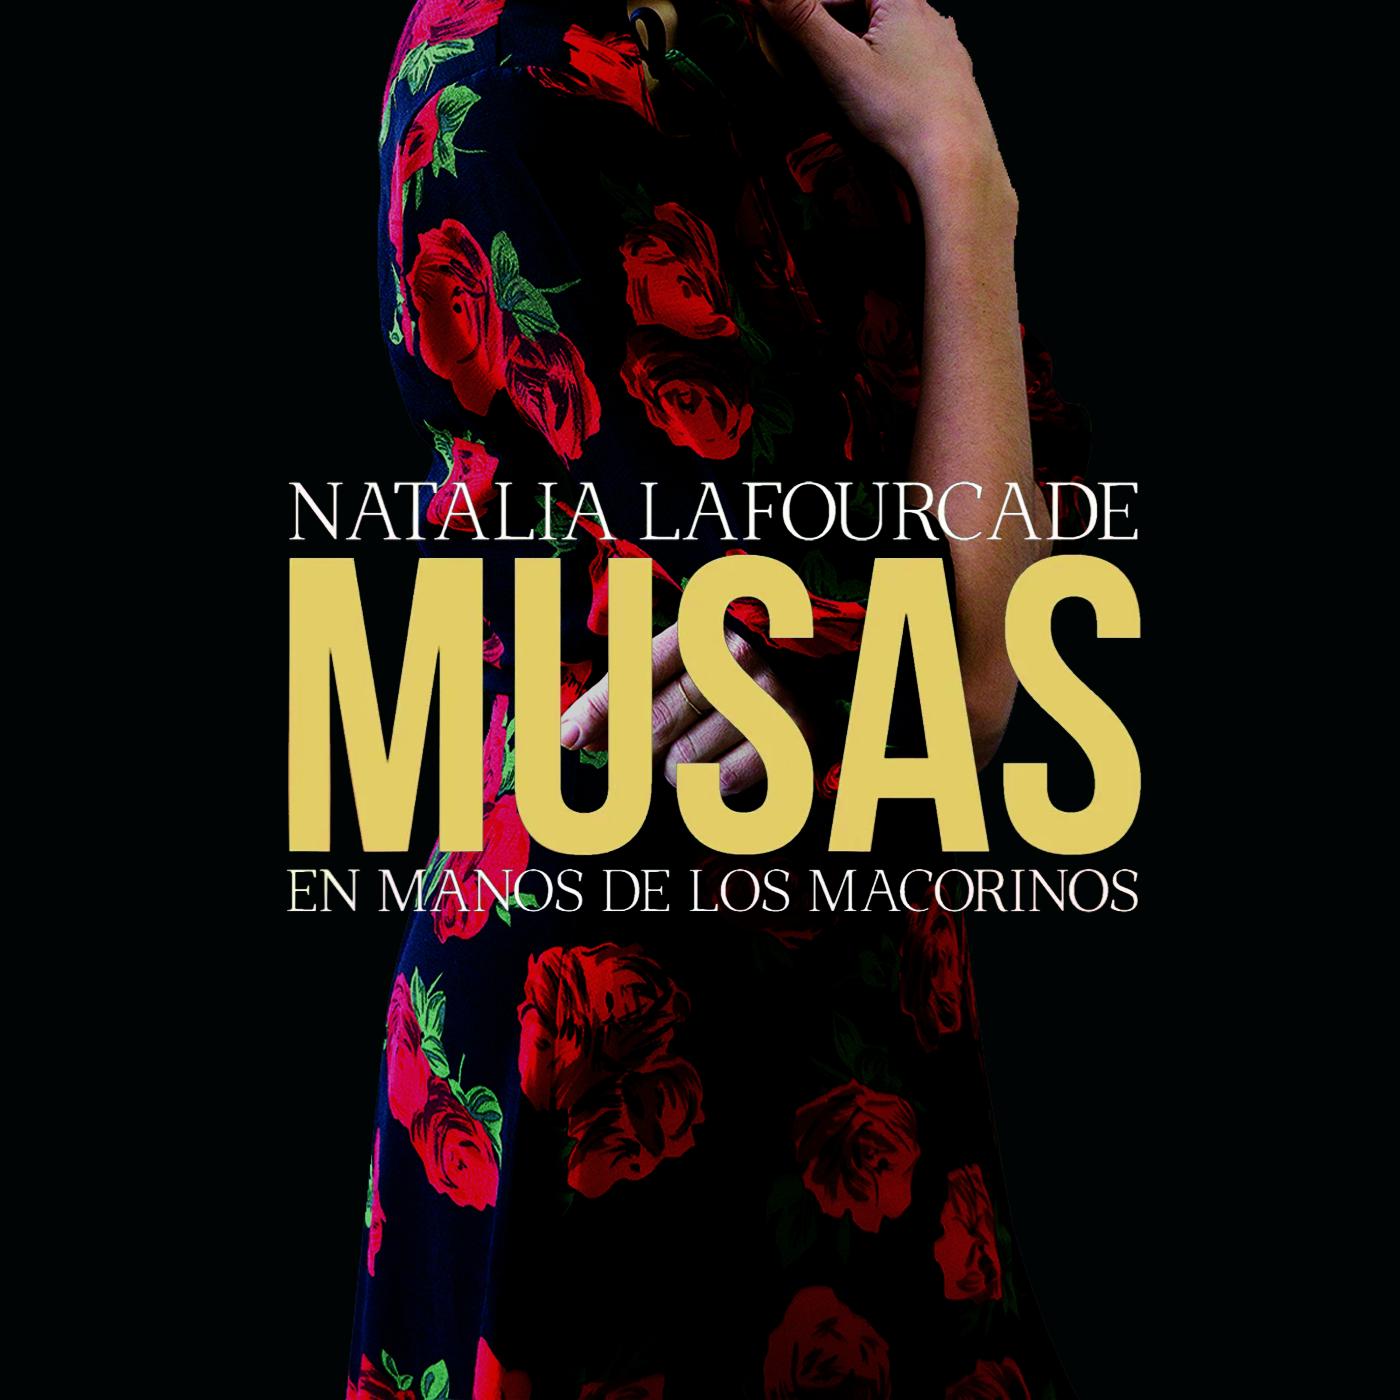 Resultado de imagen para MUSAS NATALIA LAFOURCADE